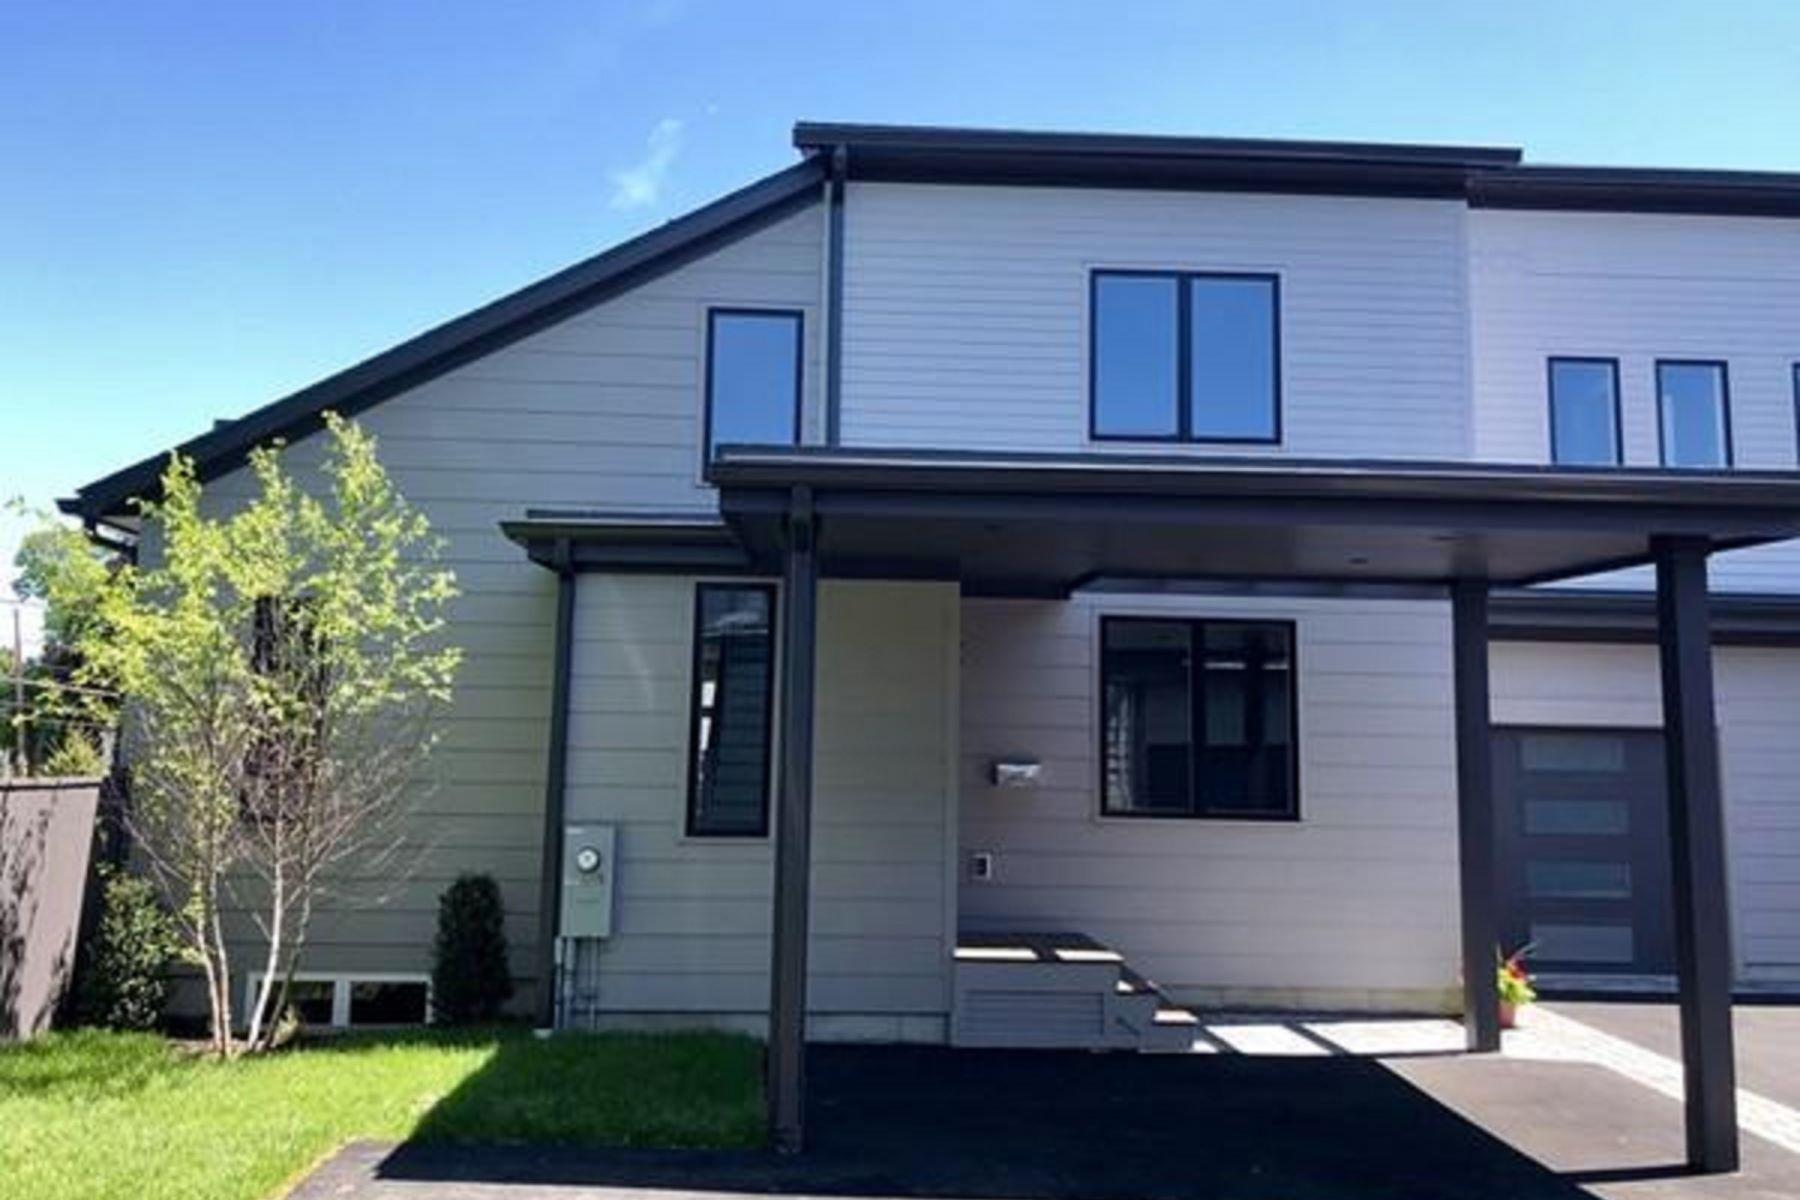 Single Family Homes για την Πώληση στο Newton, Μασαχουσετη 02465 Ηνωμένες Πολιτείες